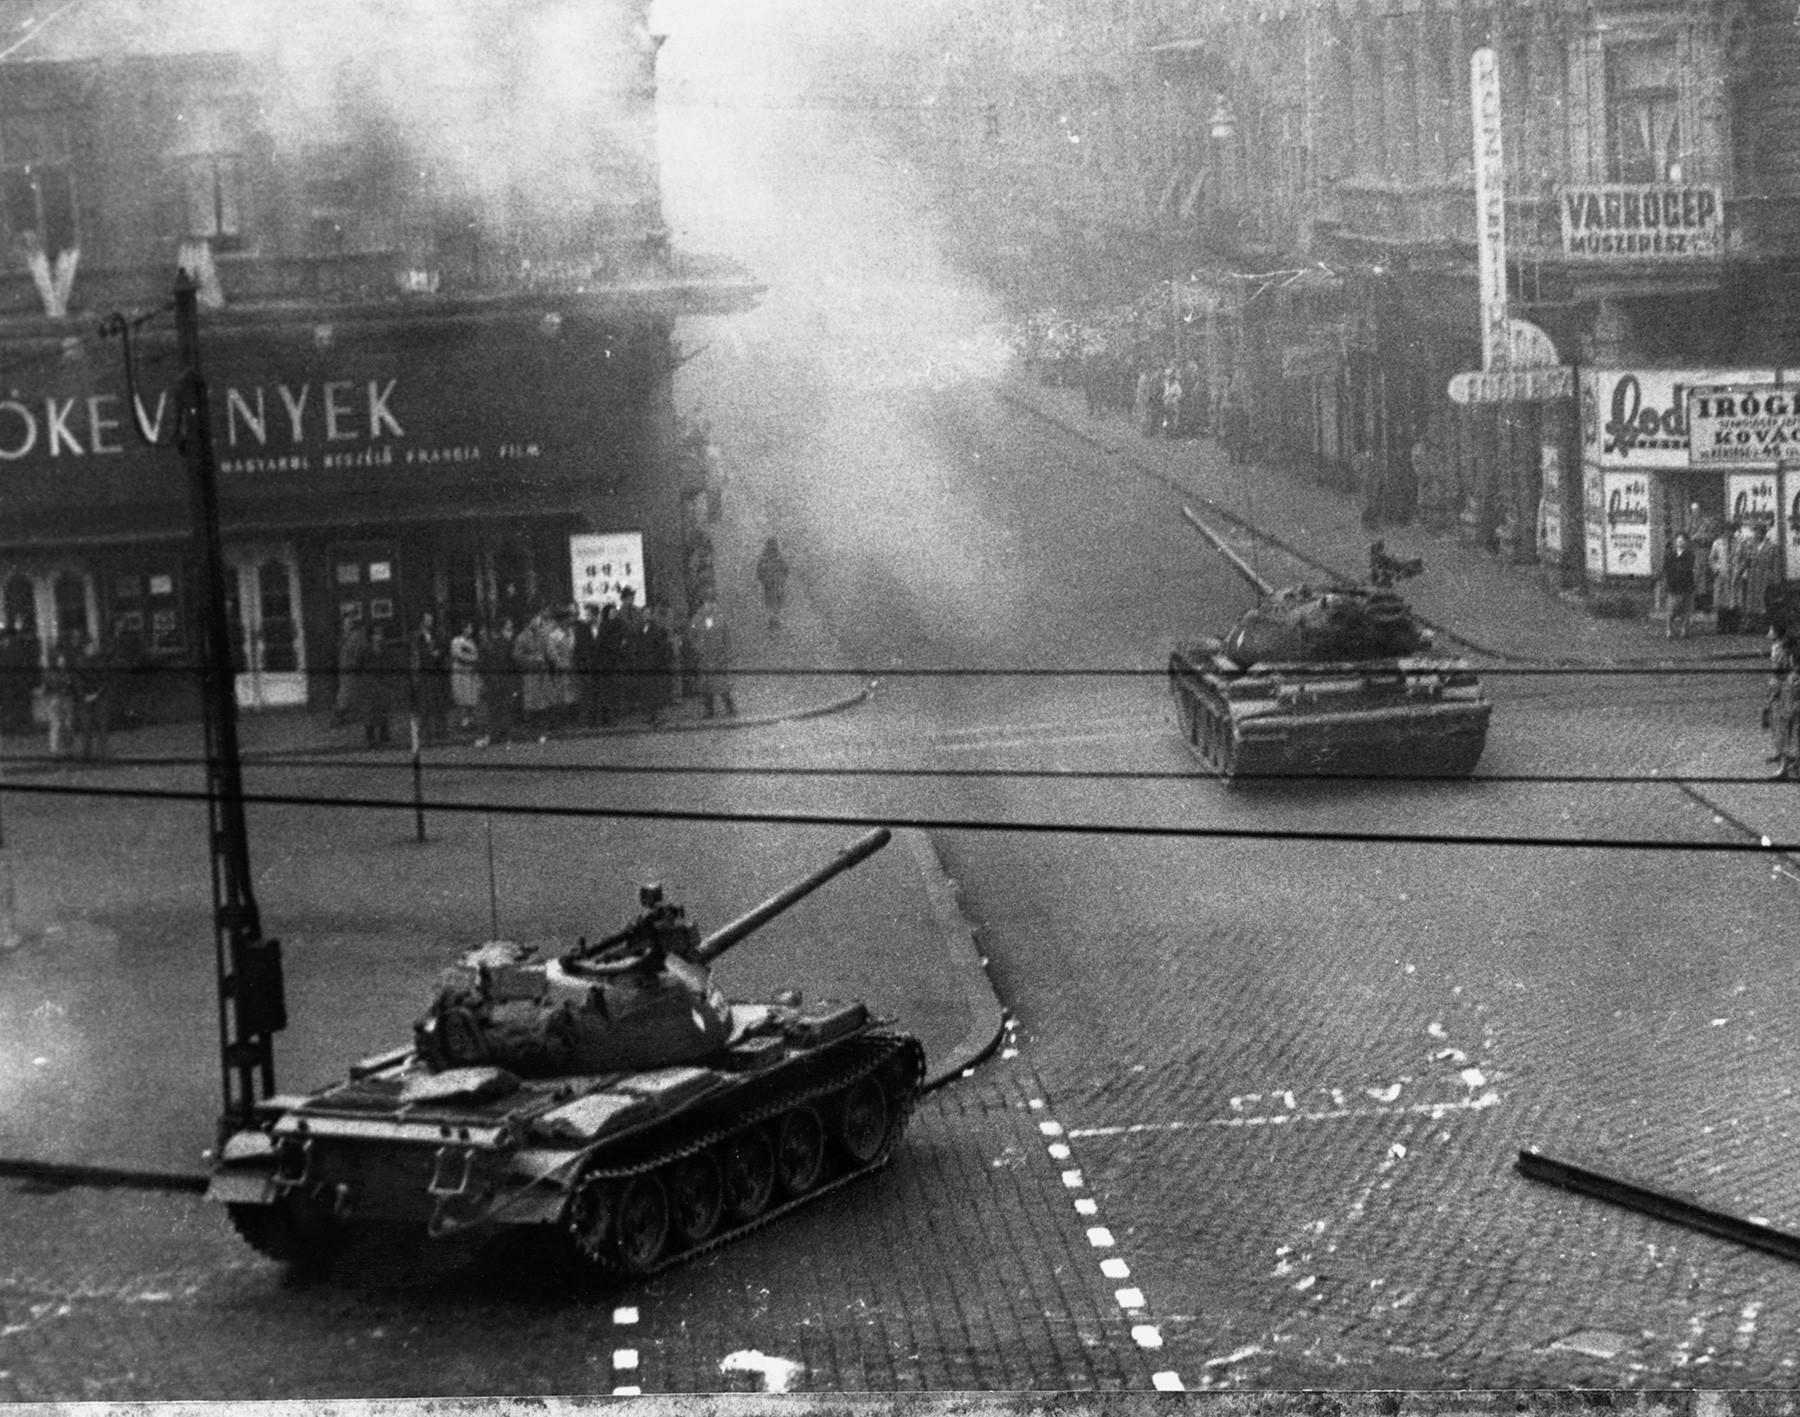 Tanques soviéticos en Budapest durante la revuelta húngara de 1956.